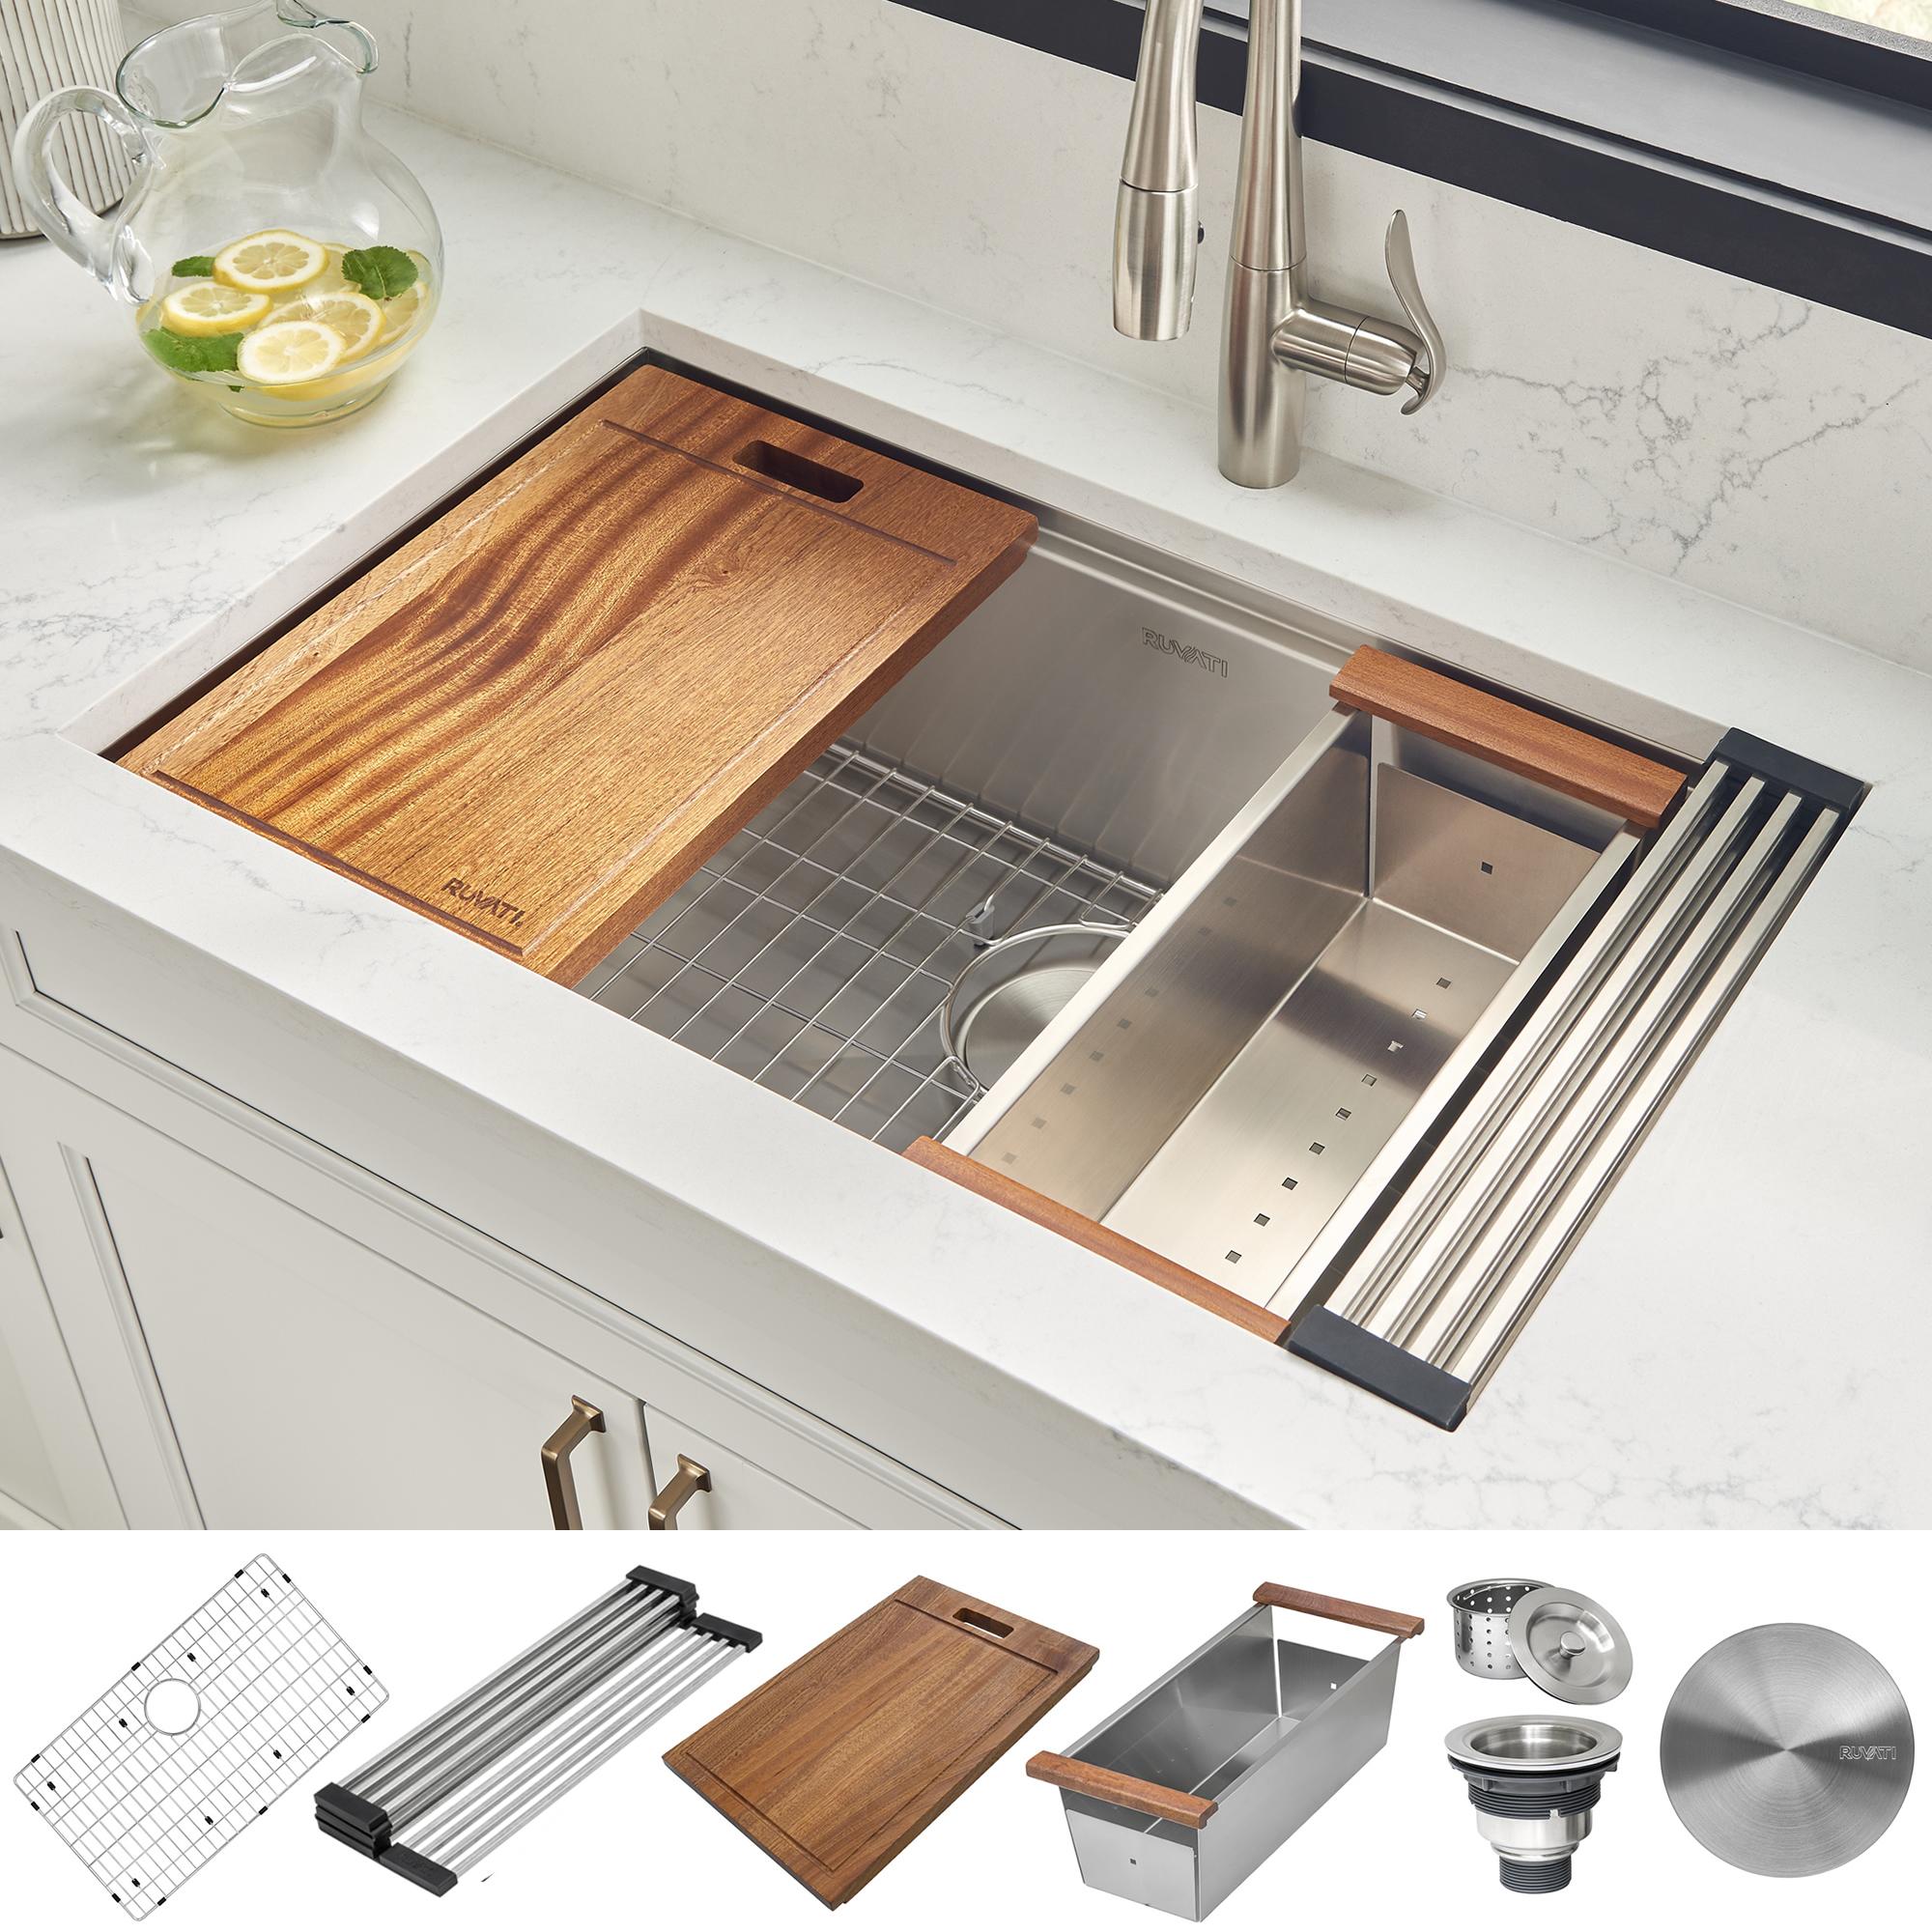 30 Inch Workstation Ledge Undermount 16 Gauge Stainless Steel Kitchen Sink Single Bowl Ruvati Usa